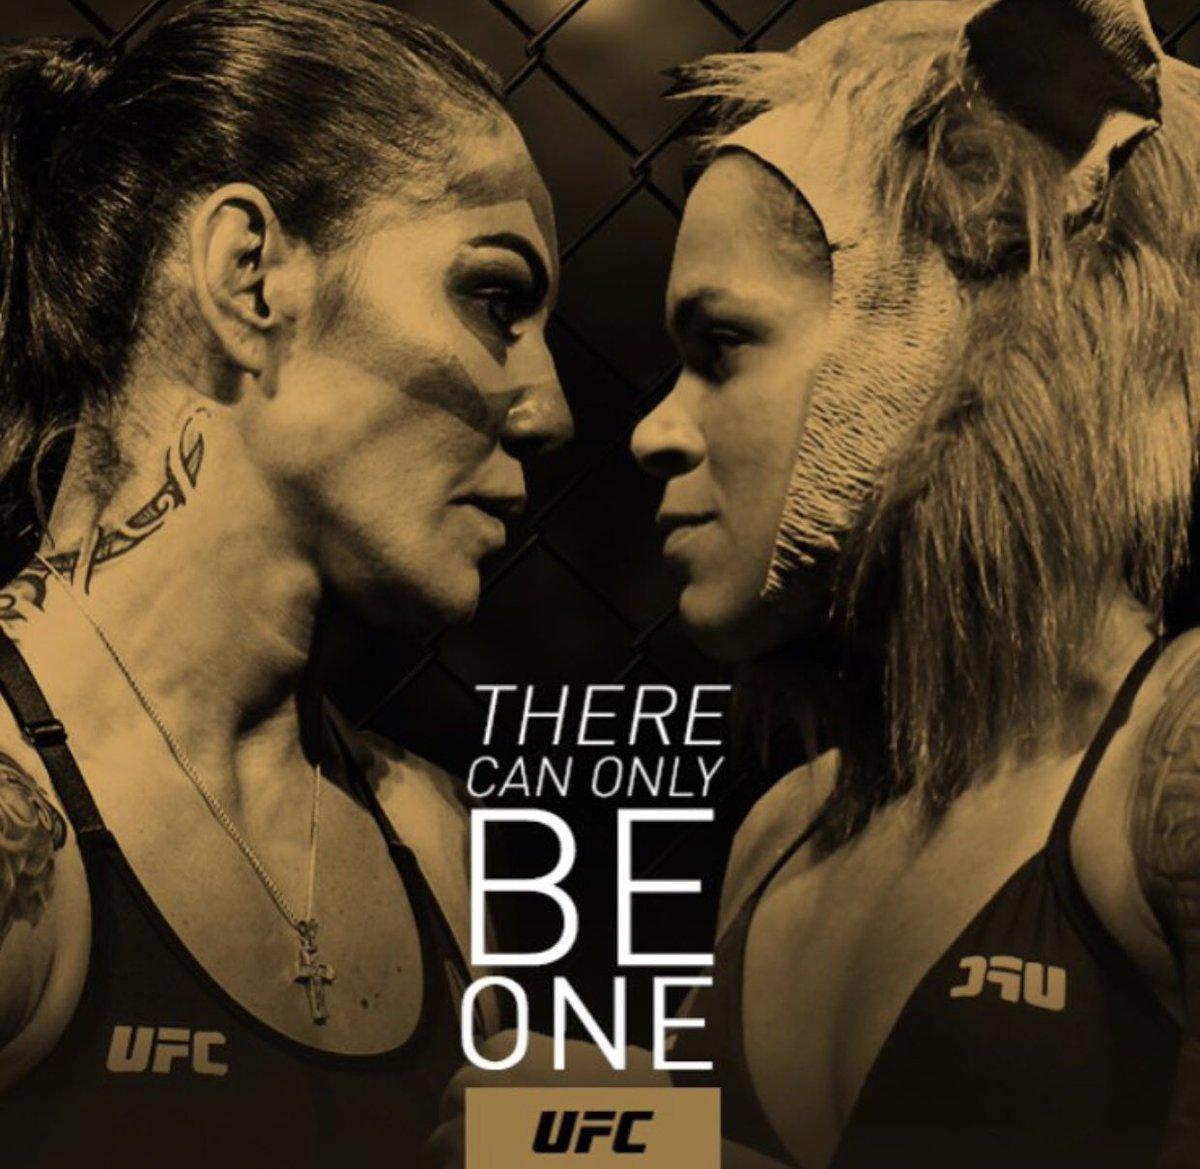 UFC 232: Champions Cris Cyborg and Amanda Nunes collide